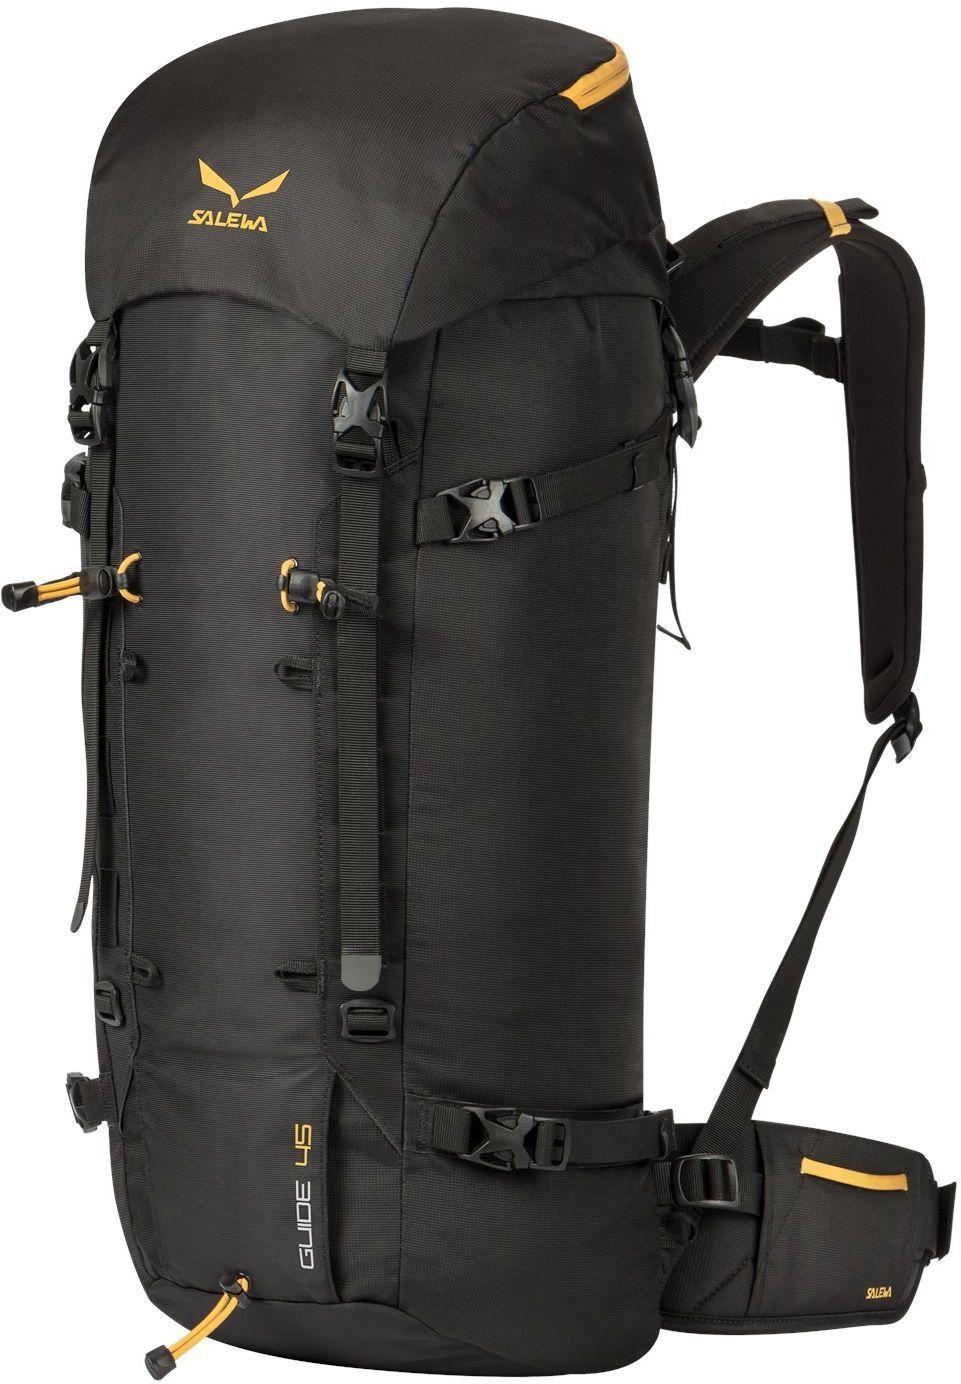 bb943b418c67b Salewa Plecak trekkingowy Guide 45 Black - 7270091430 - oficjalne ...